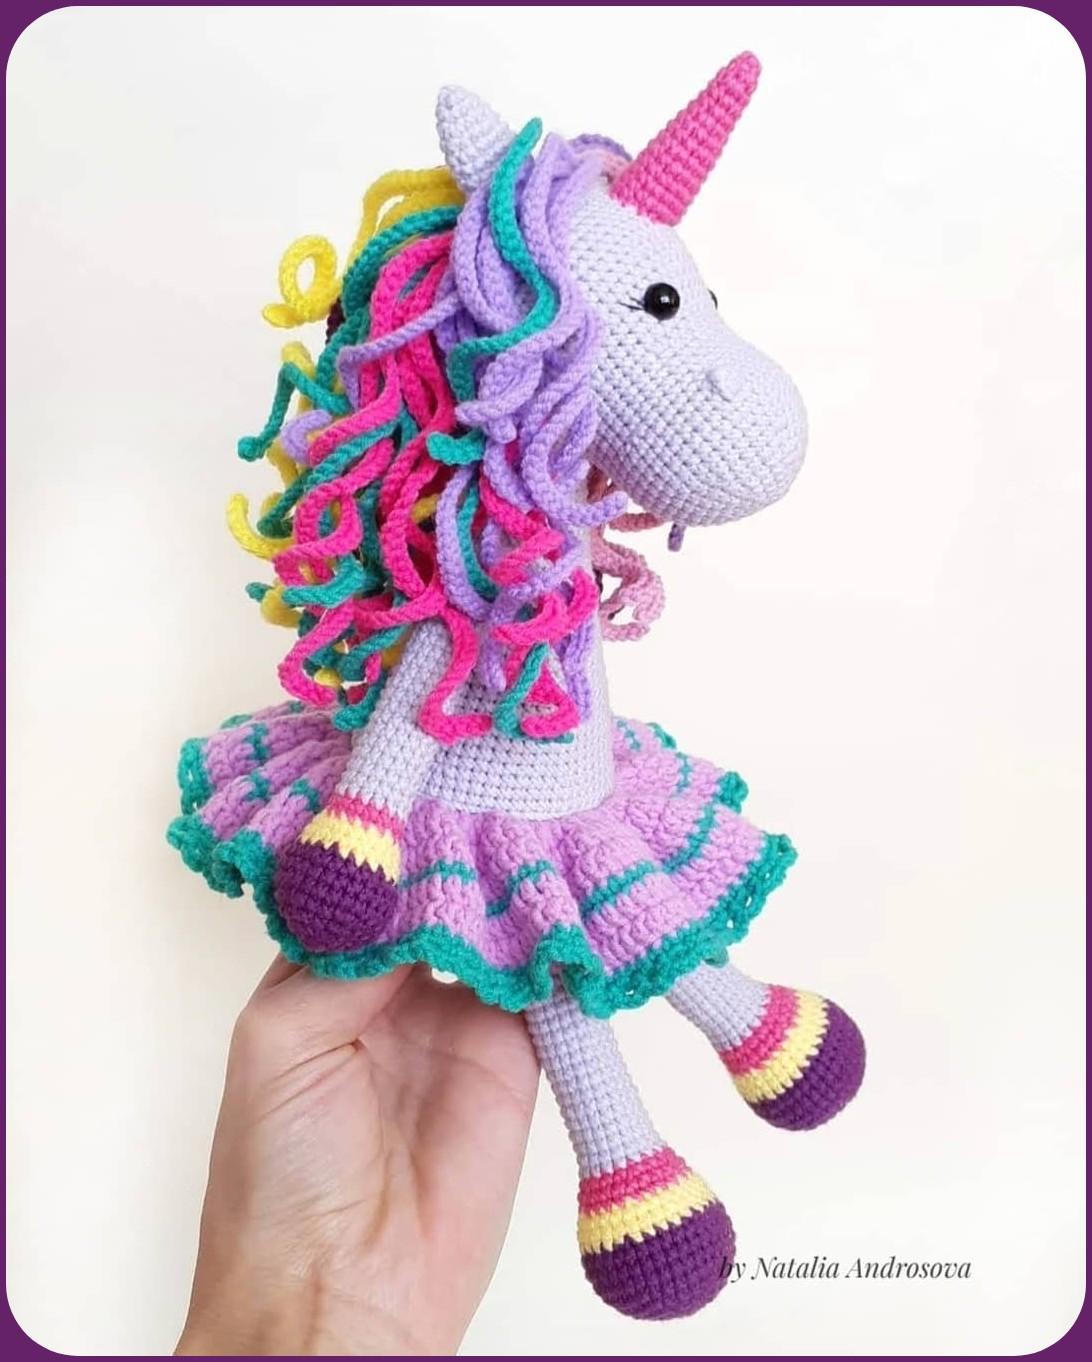 Kendi Kendine Yap | Unicorn Amigurumi Tarifi | 1362x1092